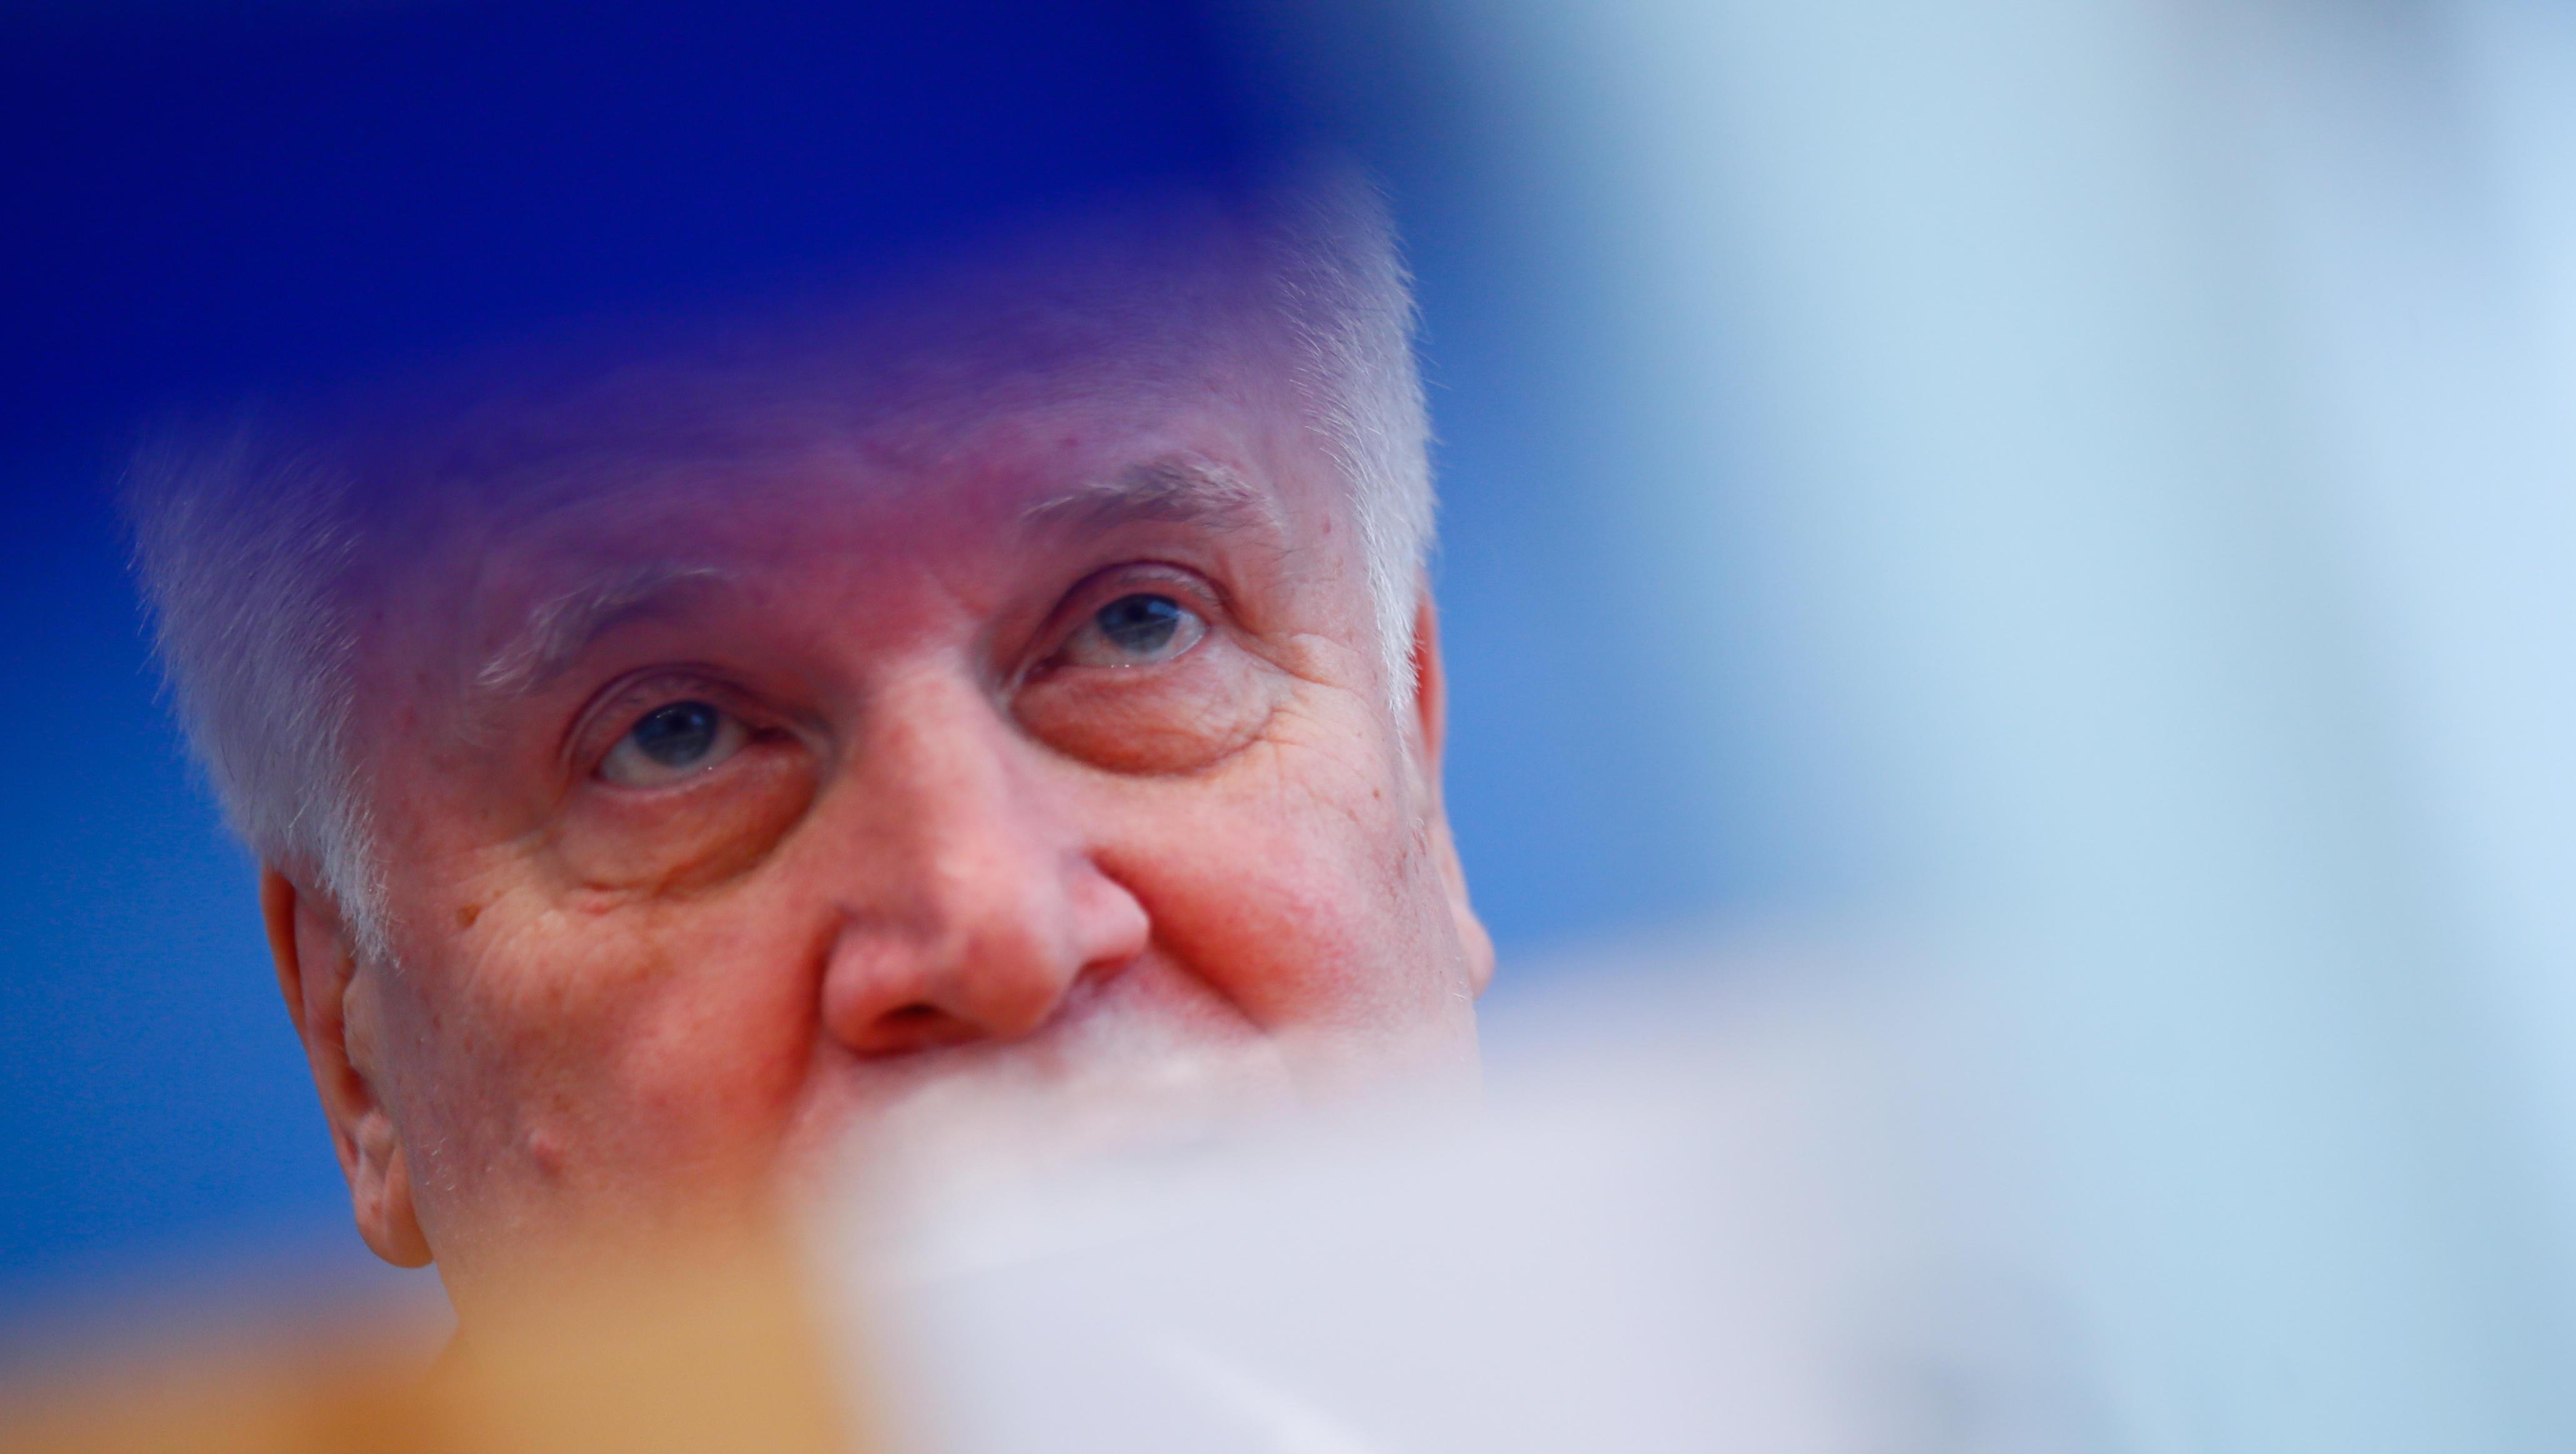 Seehofer attackiert EU-Kommission wegen Seenotrettung und Asylpolitik